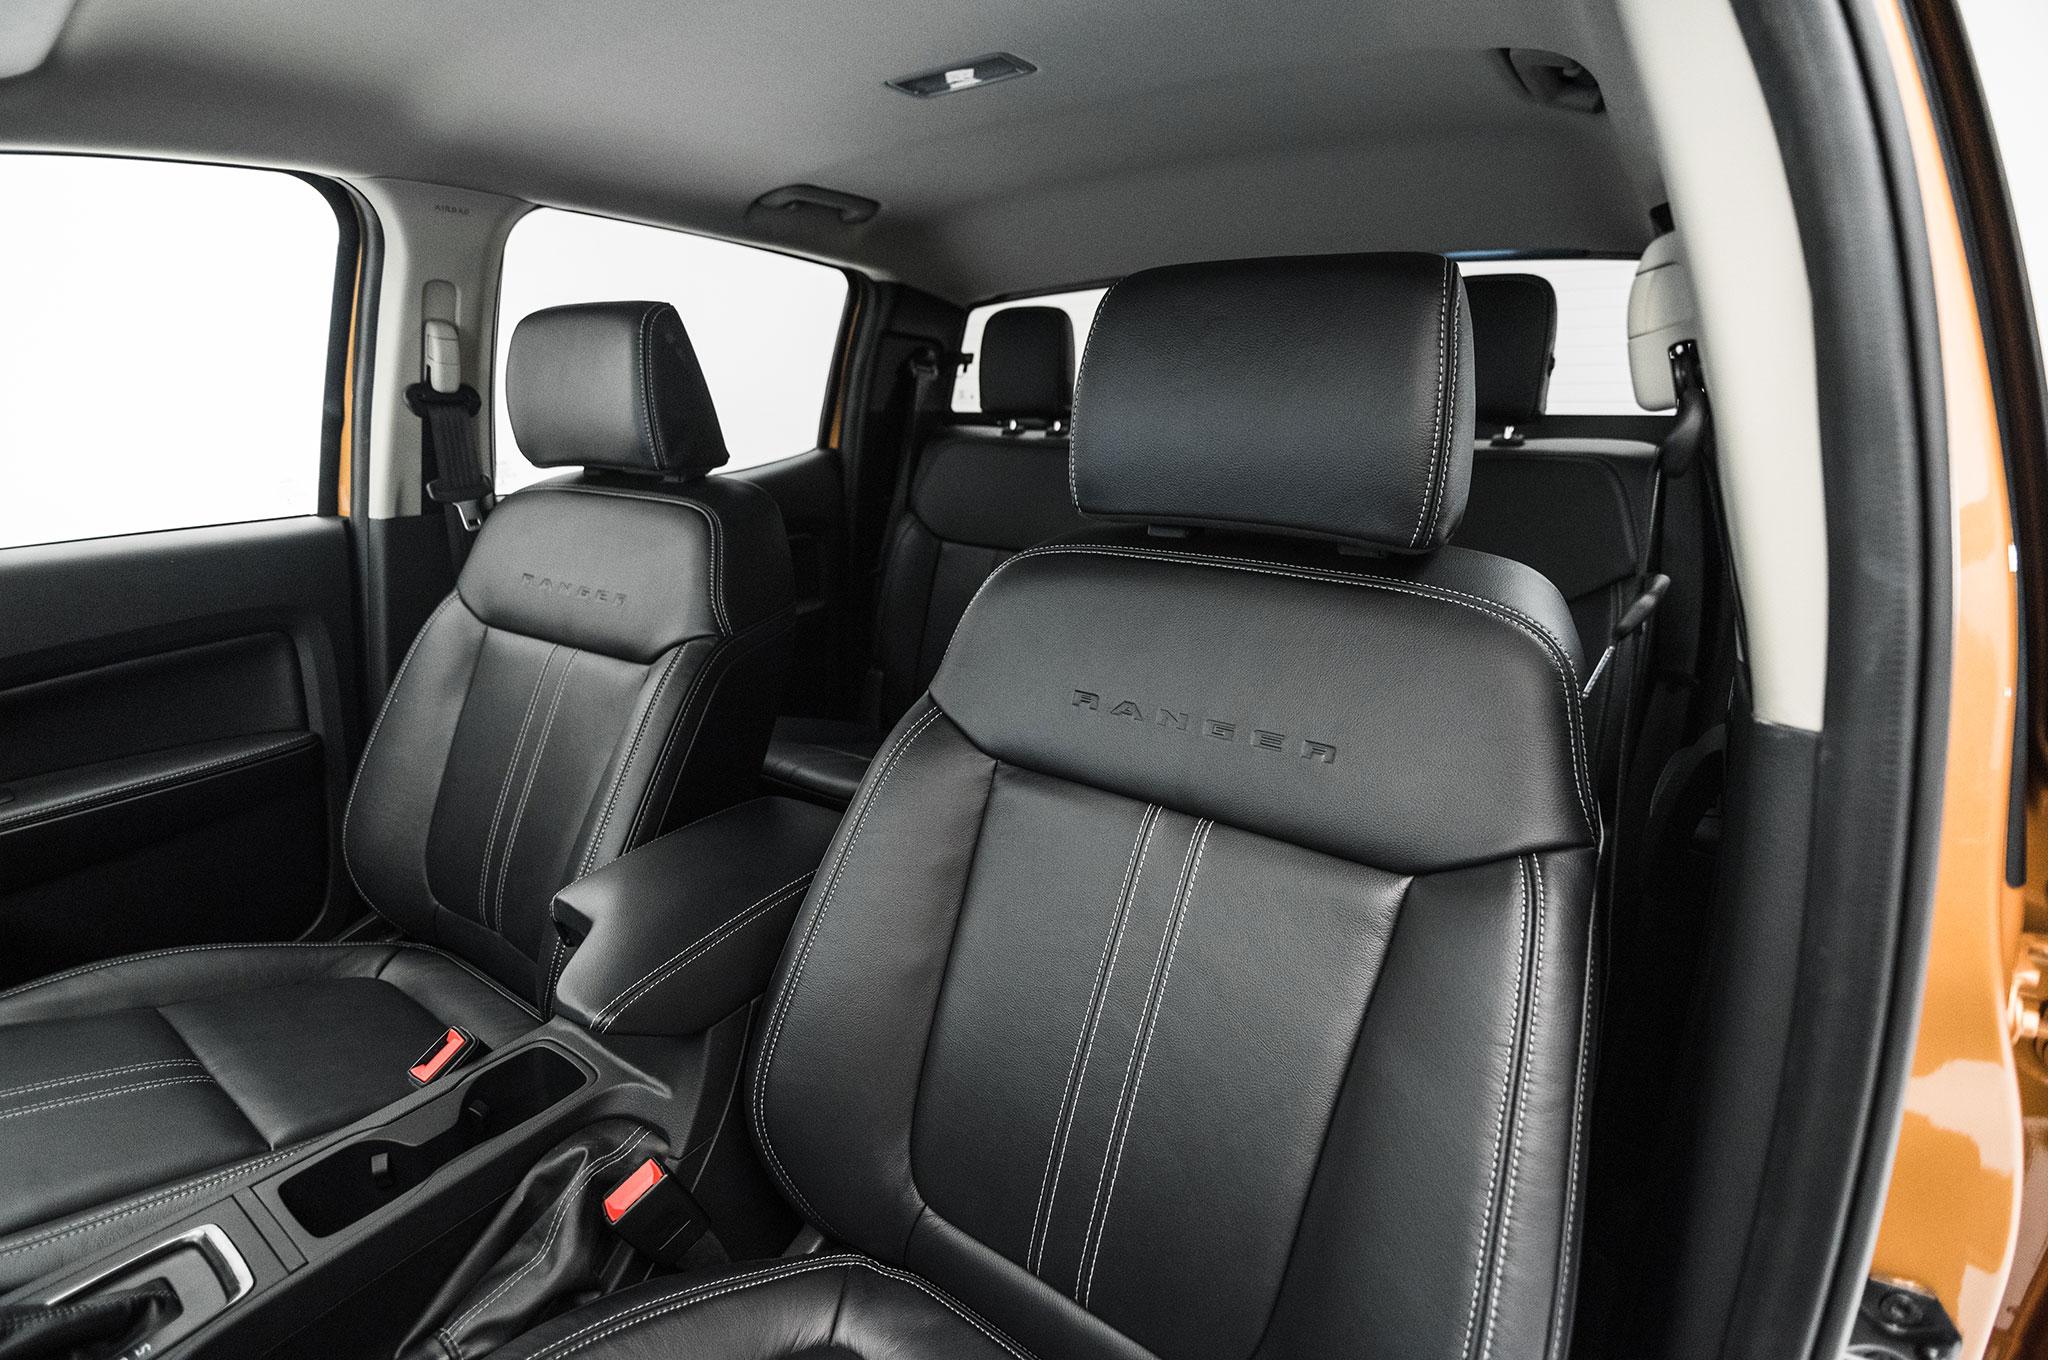 99 ranger seats